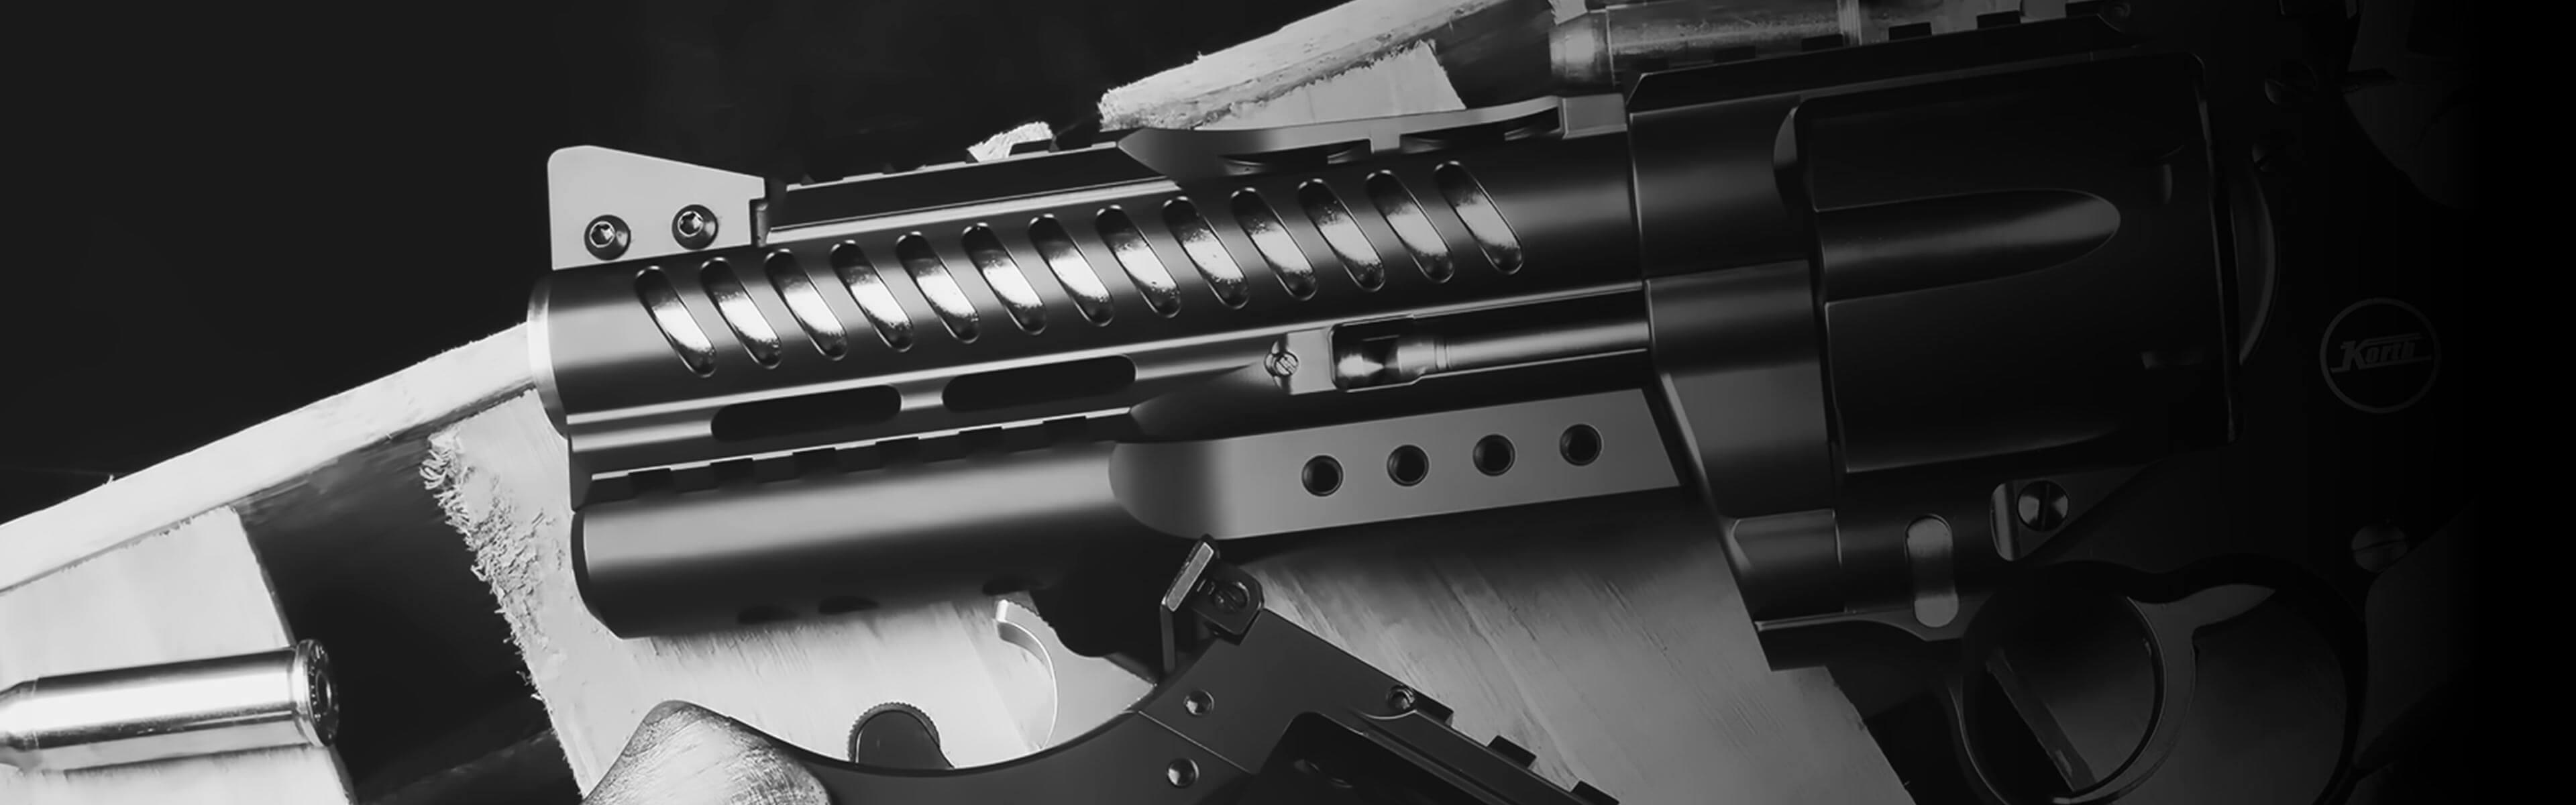 .357 / 9mm Revolvers